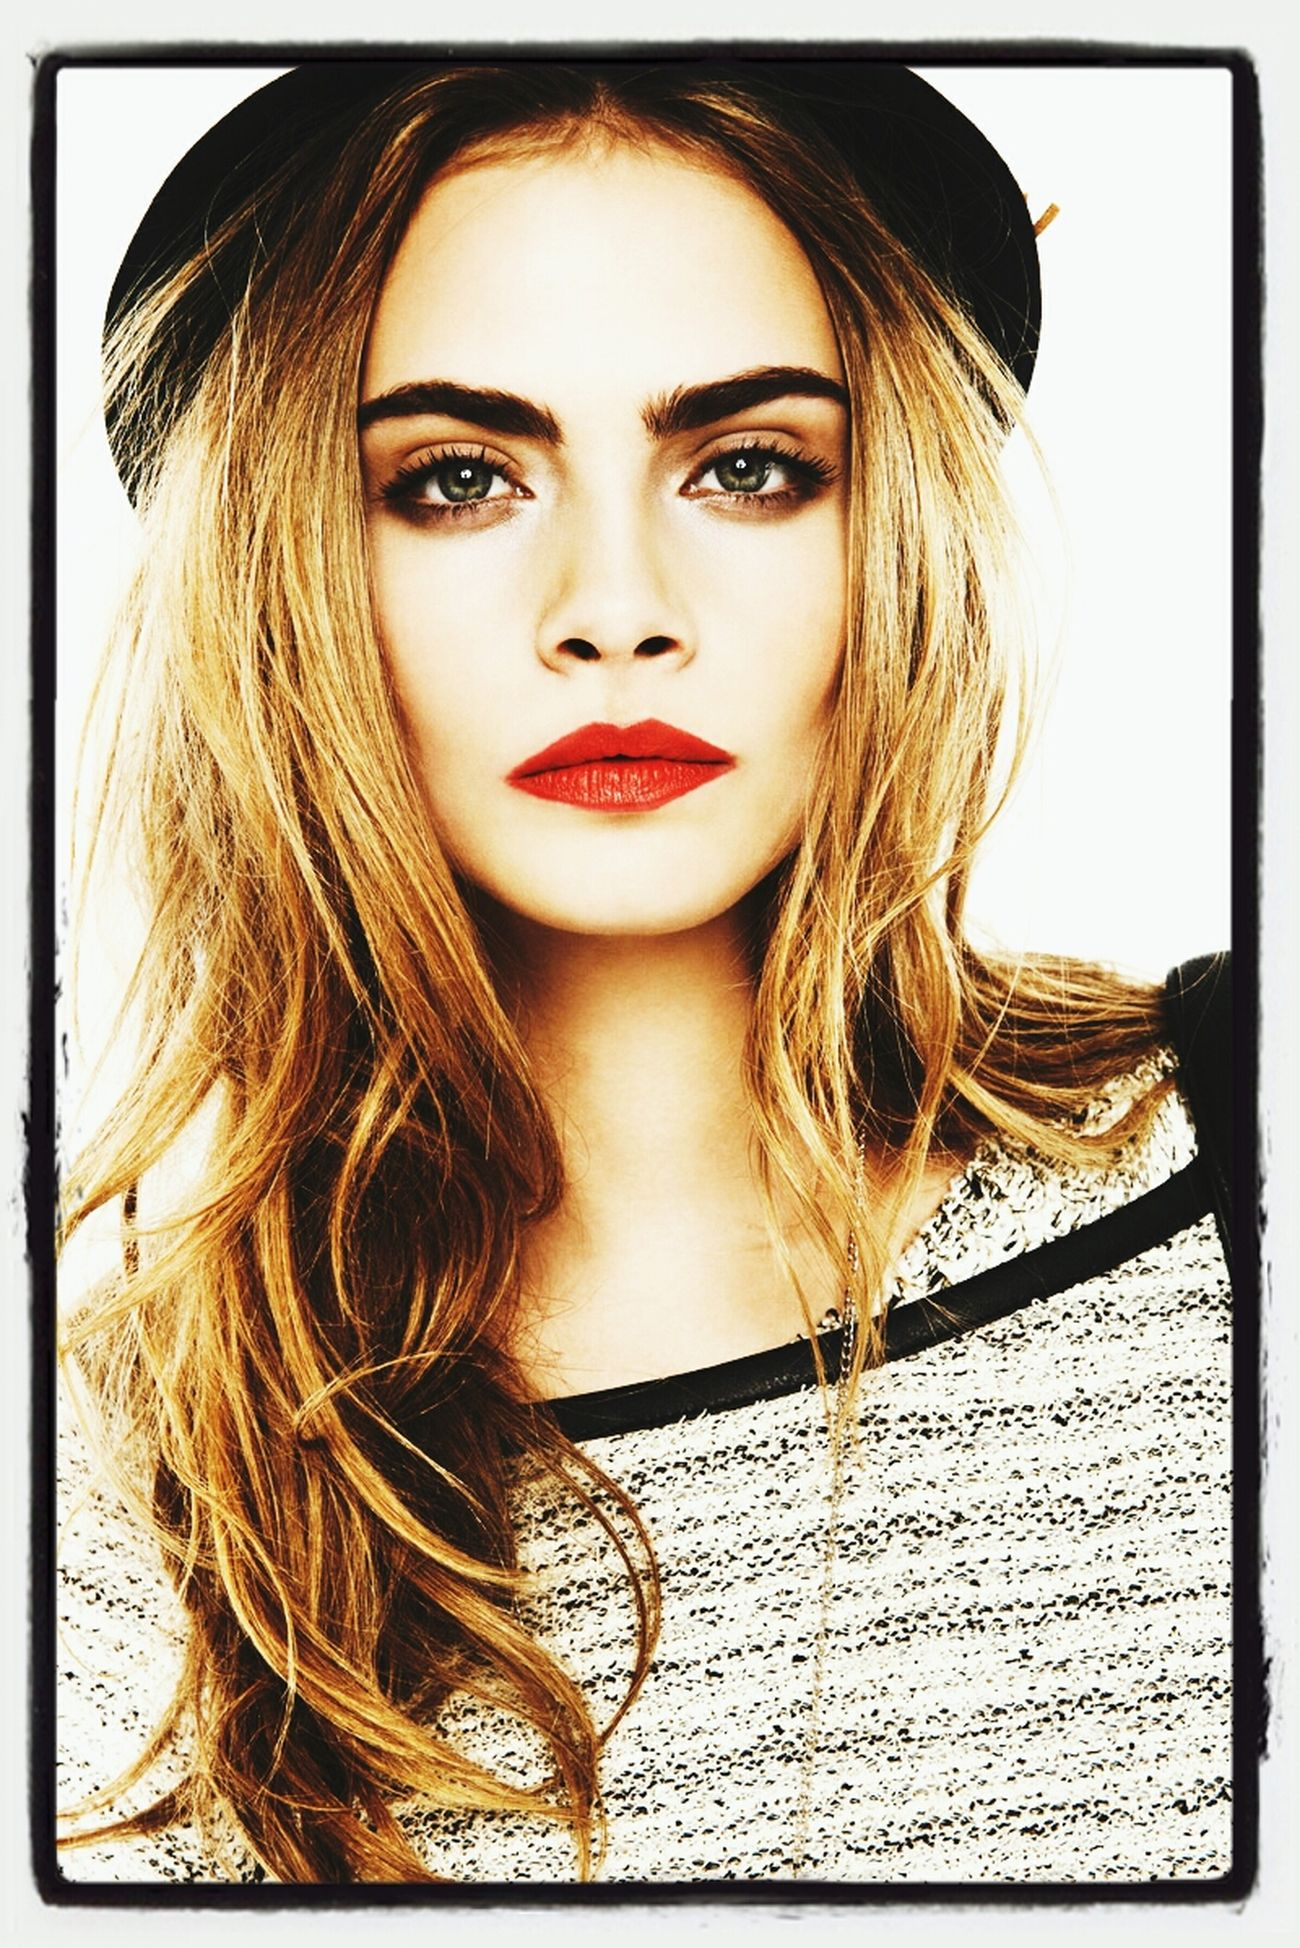 Cara Delevingne It Girl British Beautiful Fashion